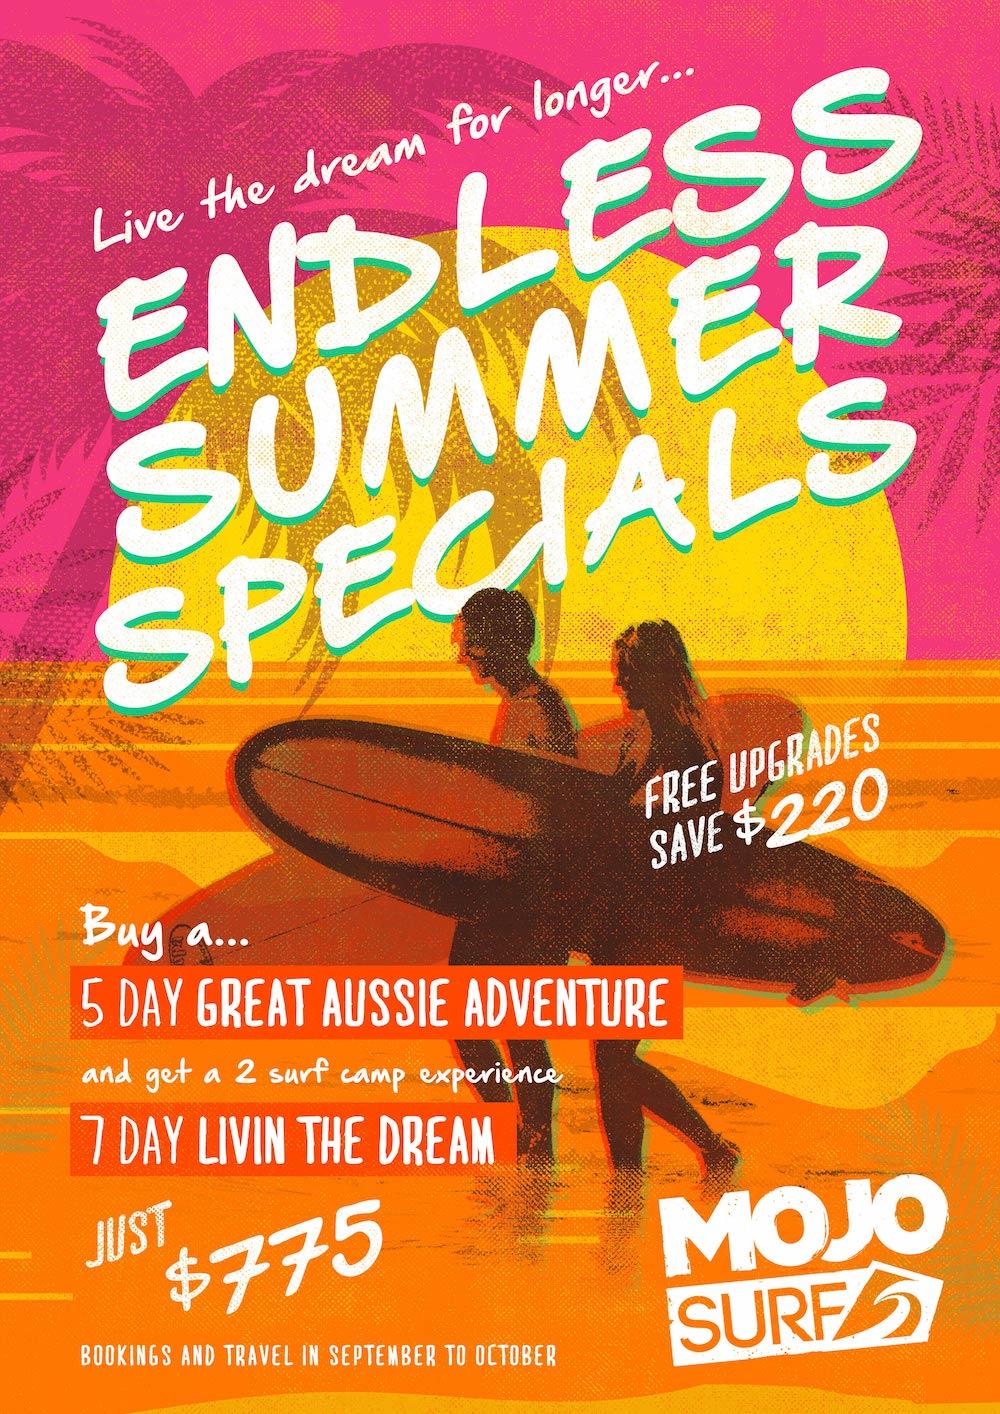 Mojosurf Surf Adventure Specials